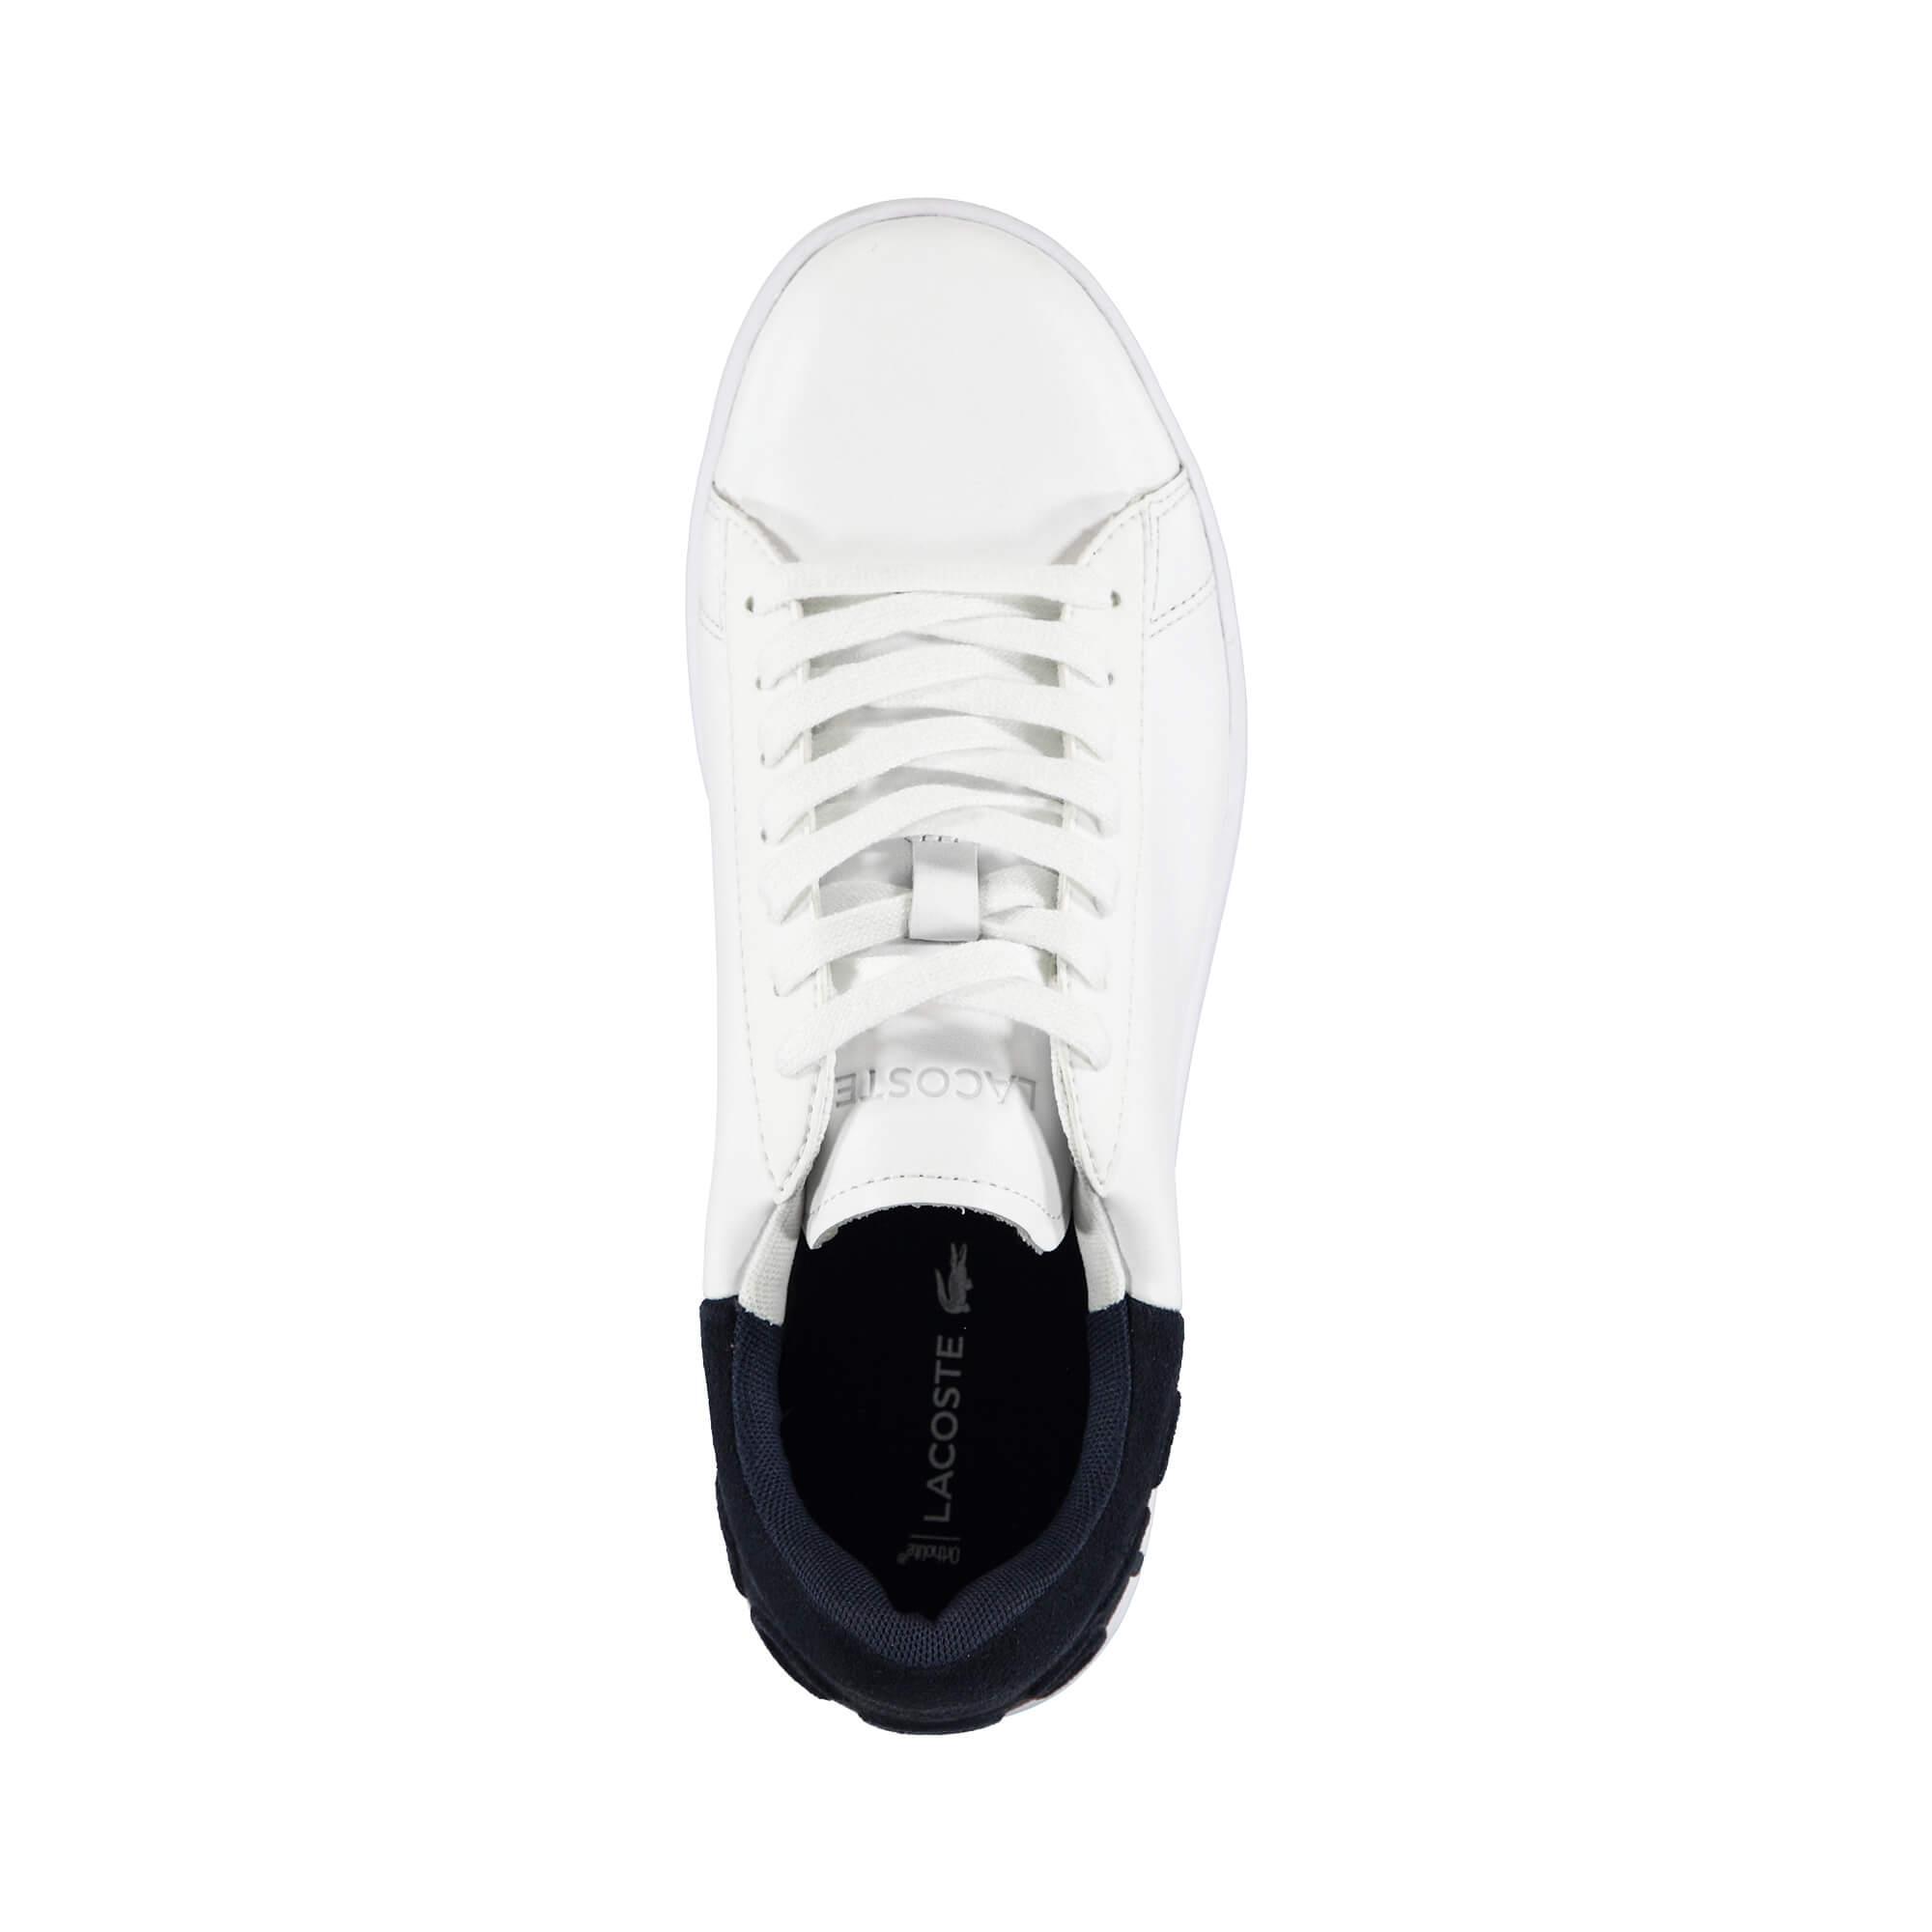 Lacoste Women's Carnaby Evo 318 3 Leather Sneakers